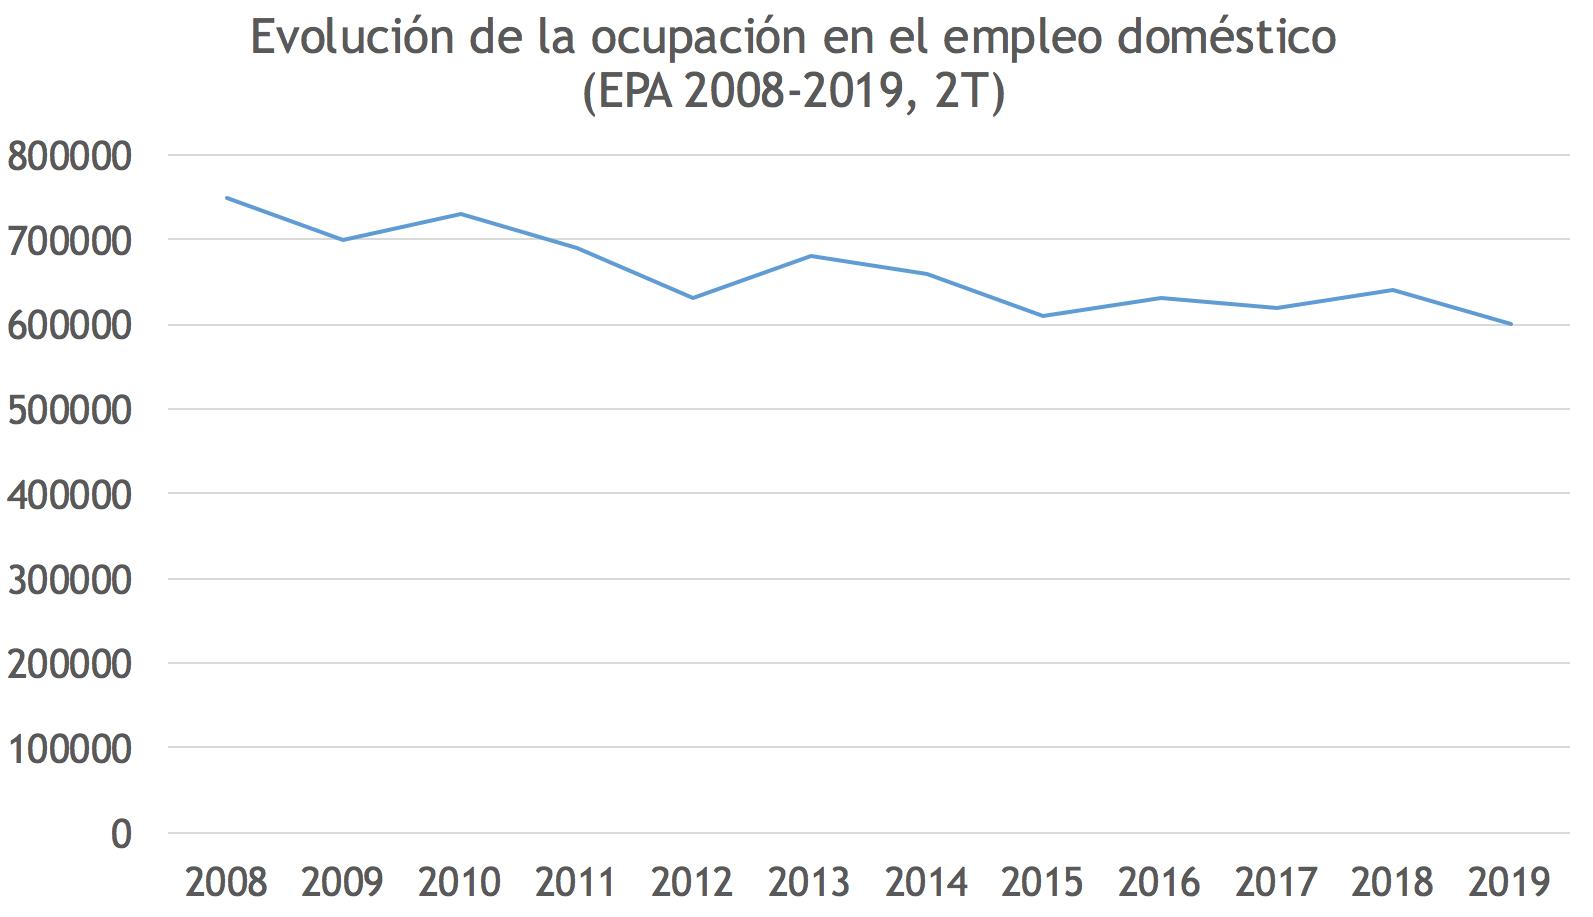 empleo-domestico-espana-epa.png